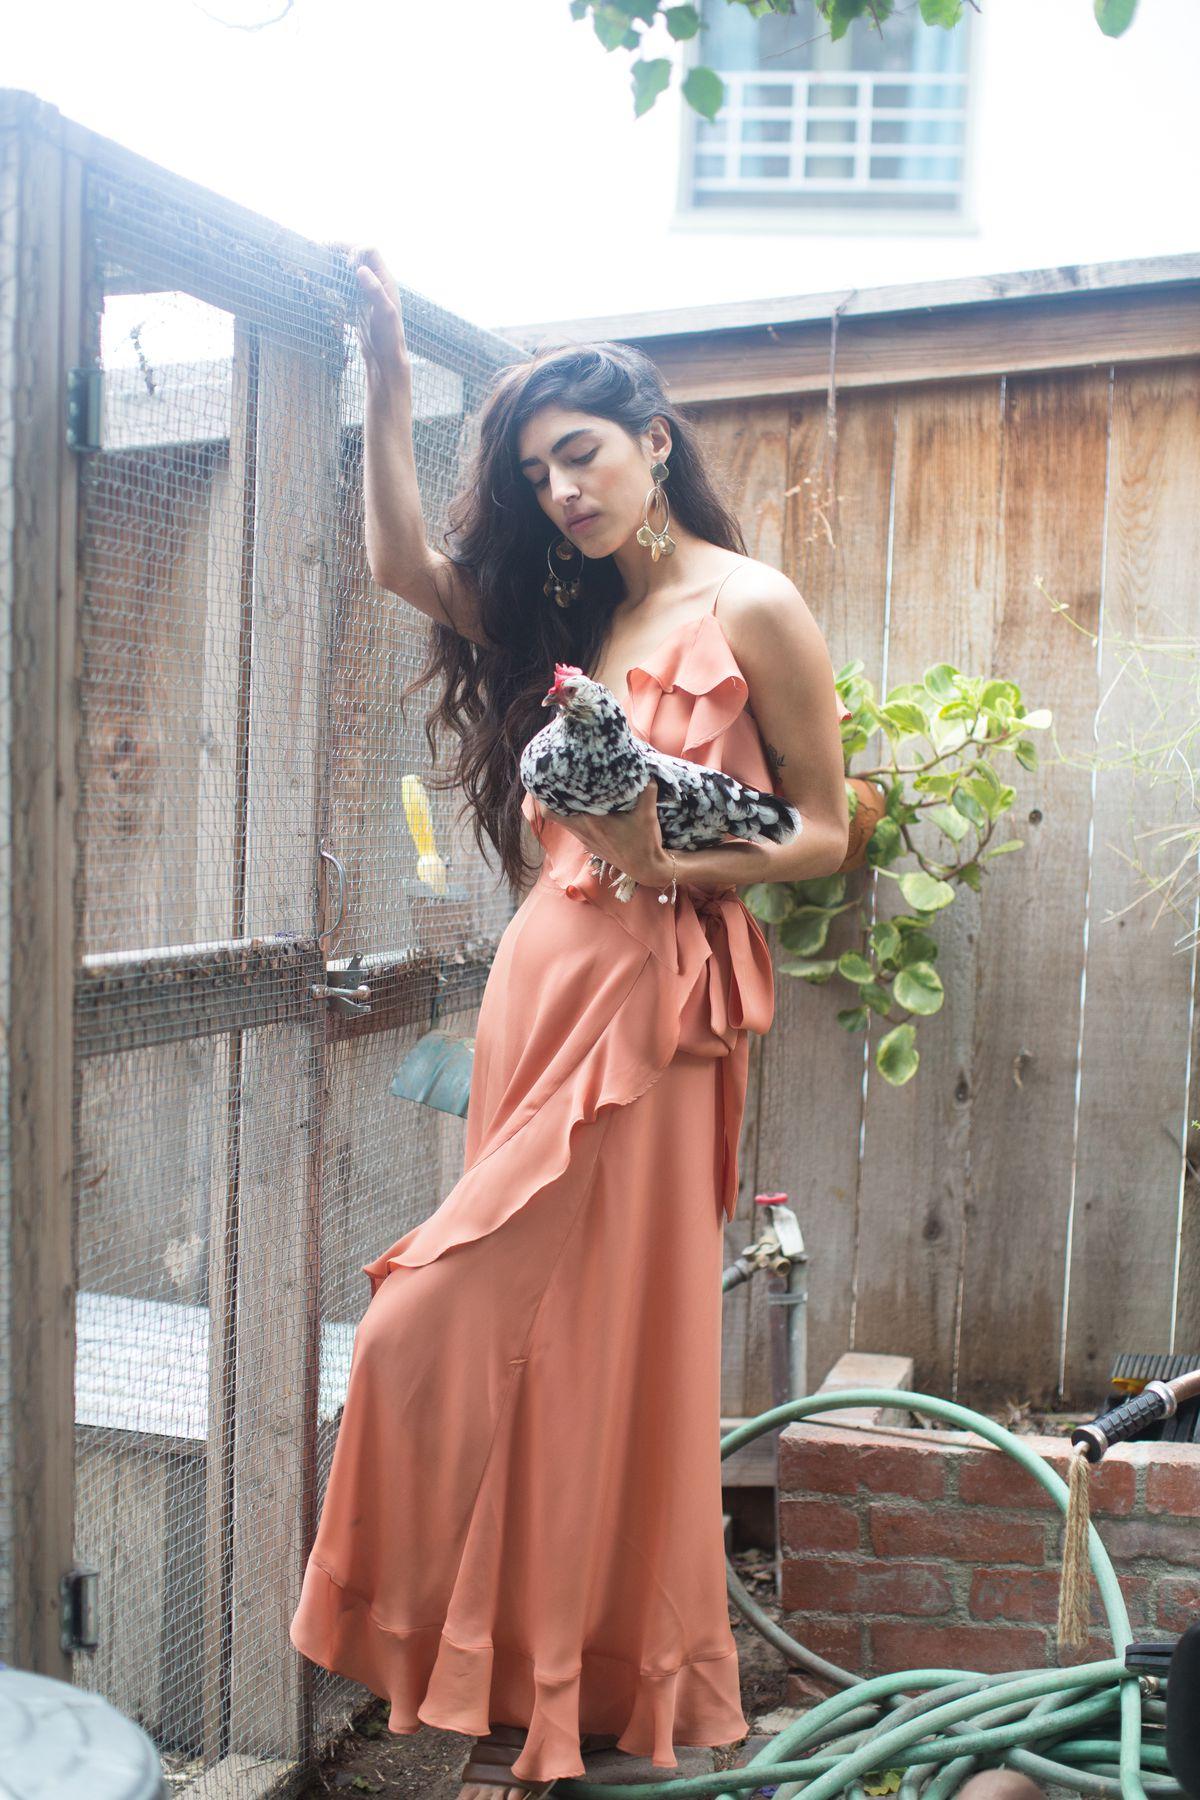 LA Tastemaker Beatrice Valenzuela Now Has a Lush, Feminine Clothing Collection